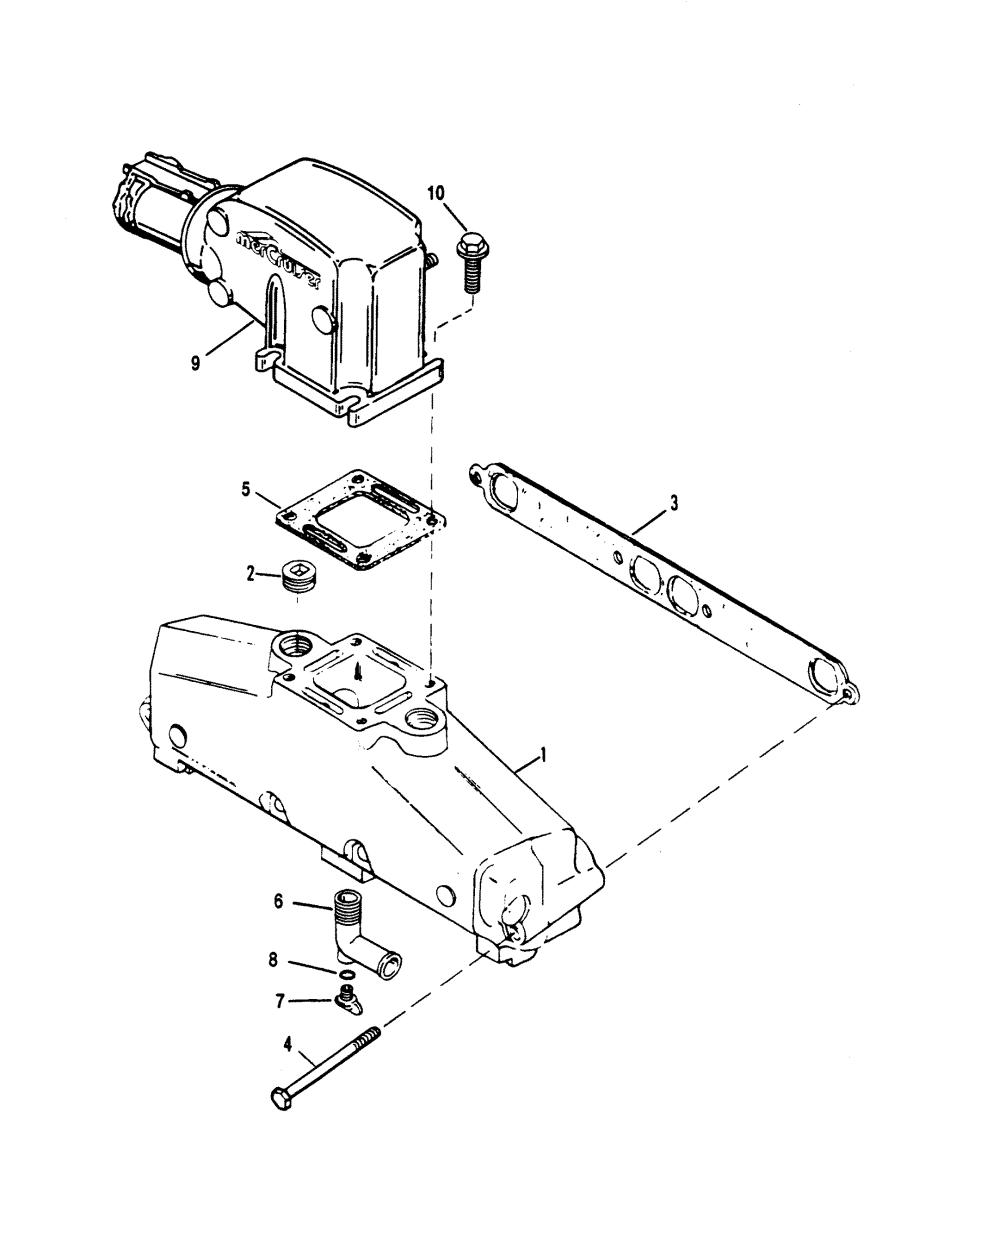 medium resolution of cp performance exhaust manifold and exhaust elbow mercruiser 0f415189 thru 0f601999 1995 alternator mando diagram